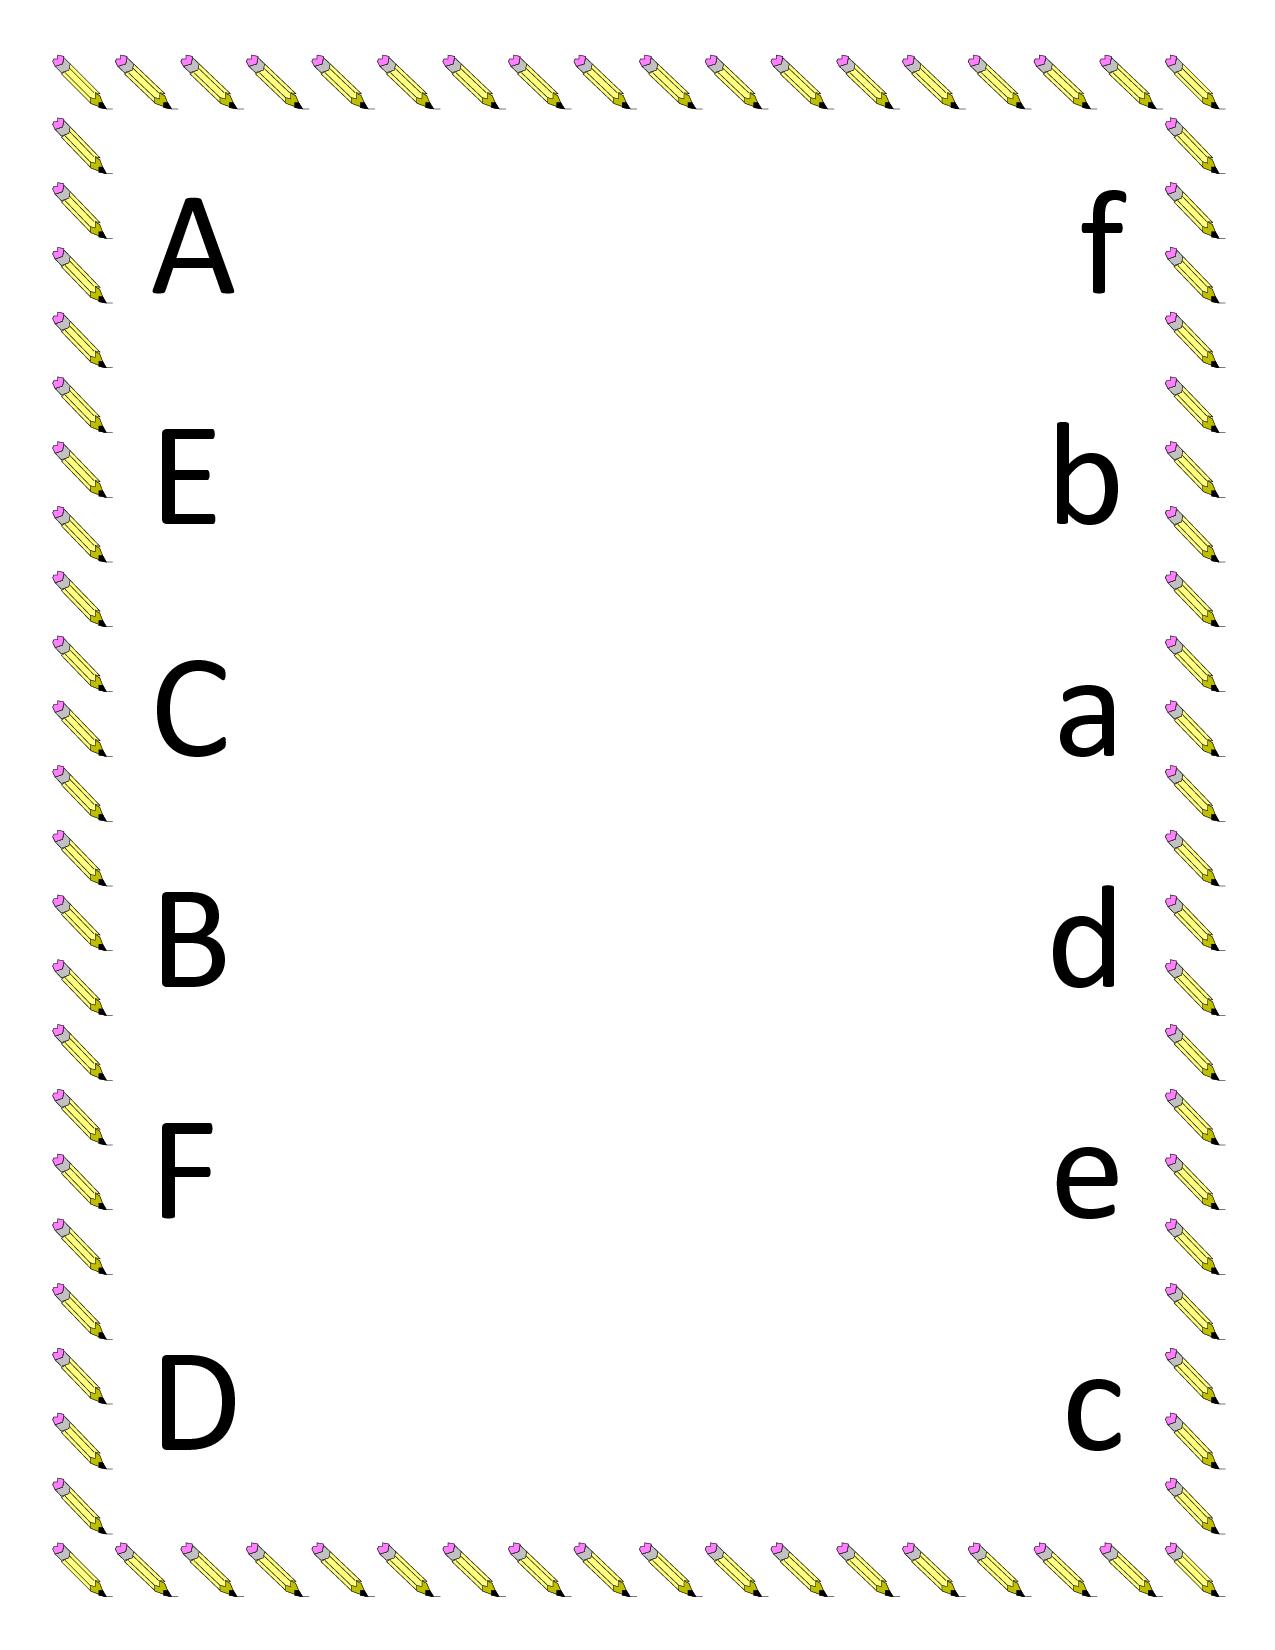 6 Best Images of Free Printable Preschool Letter X Worksheets - Letter X Tracing Worksheet, Free ...